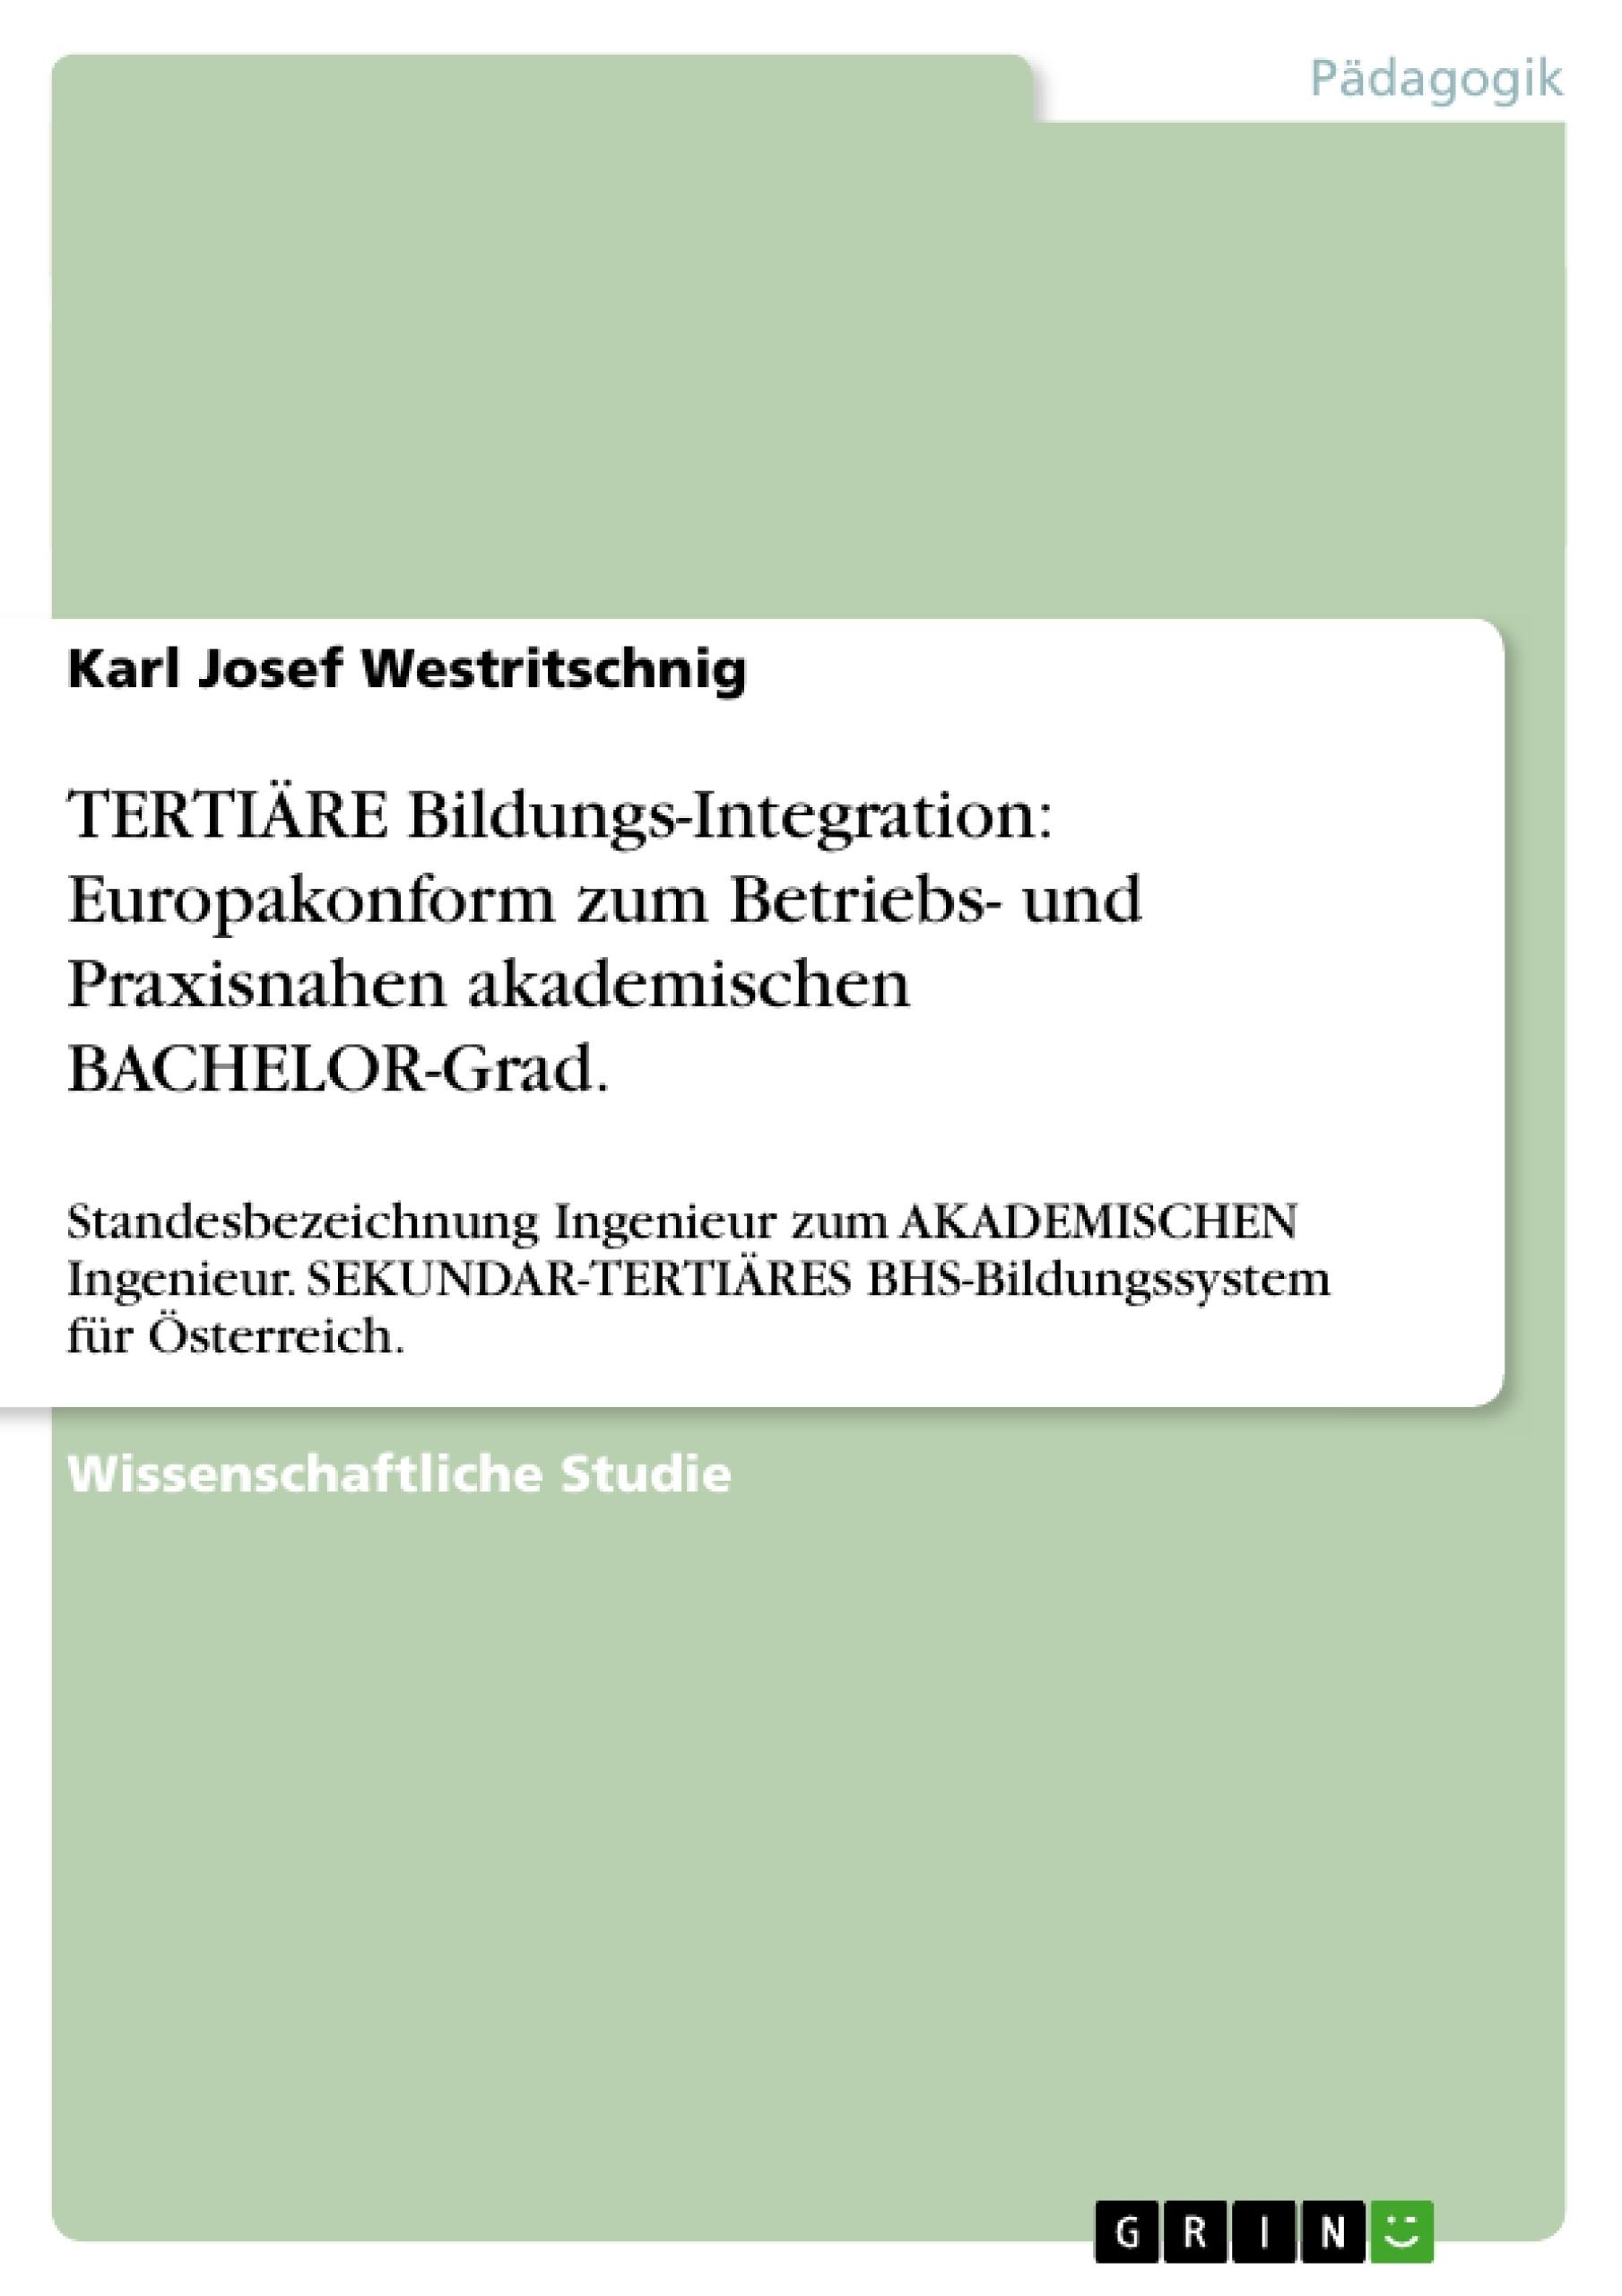 Titel: TERTIÄRE Bildungs-Integration: Europakonform zum Betriebs- und Praxisnahen akademischen BACHELOR-Grad.